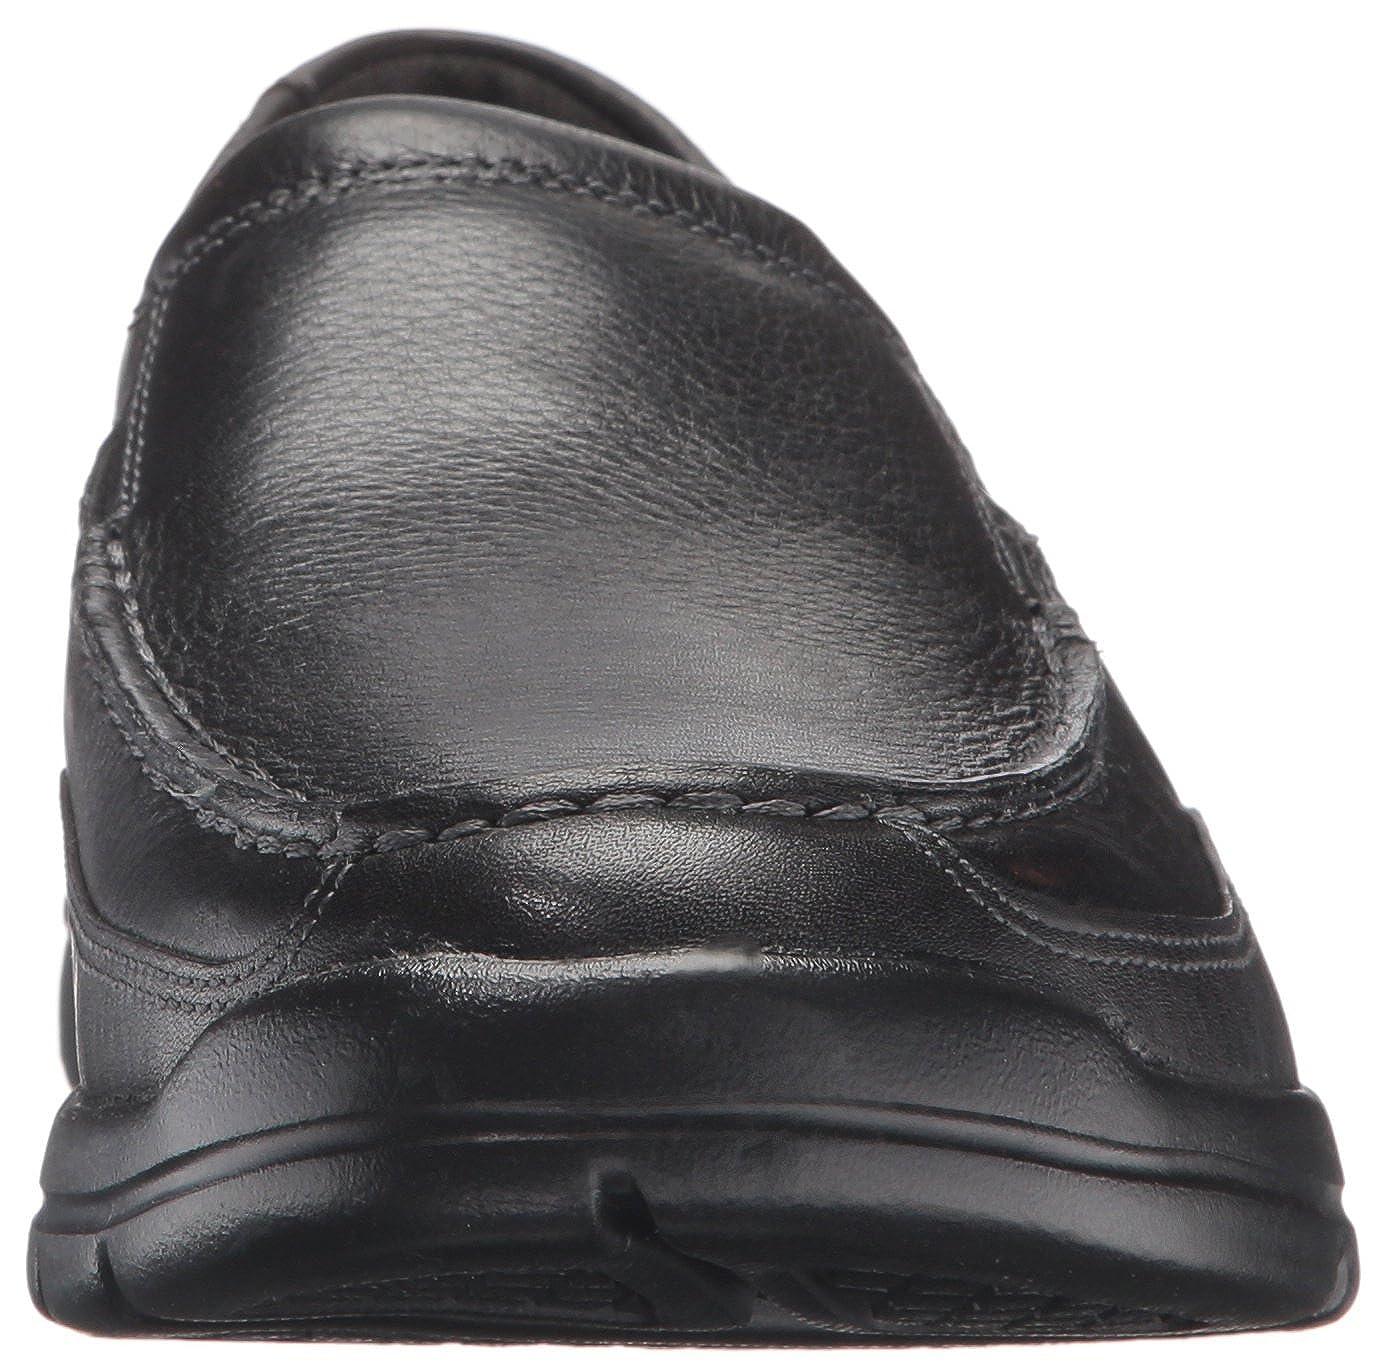 Rockport Men's Talmage Oxford, schwarz, 9 M US US US 6983e7